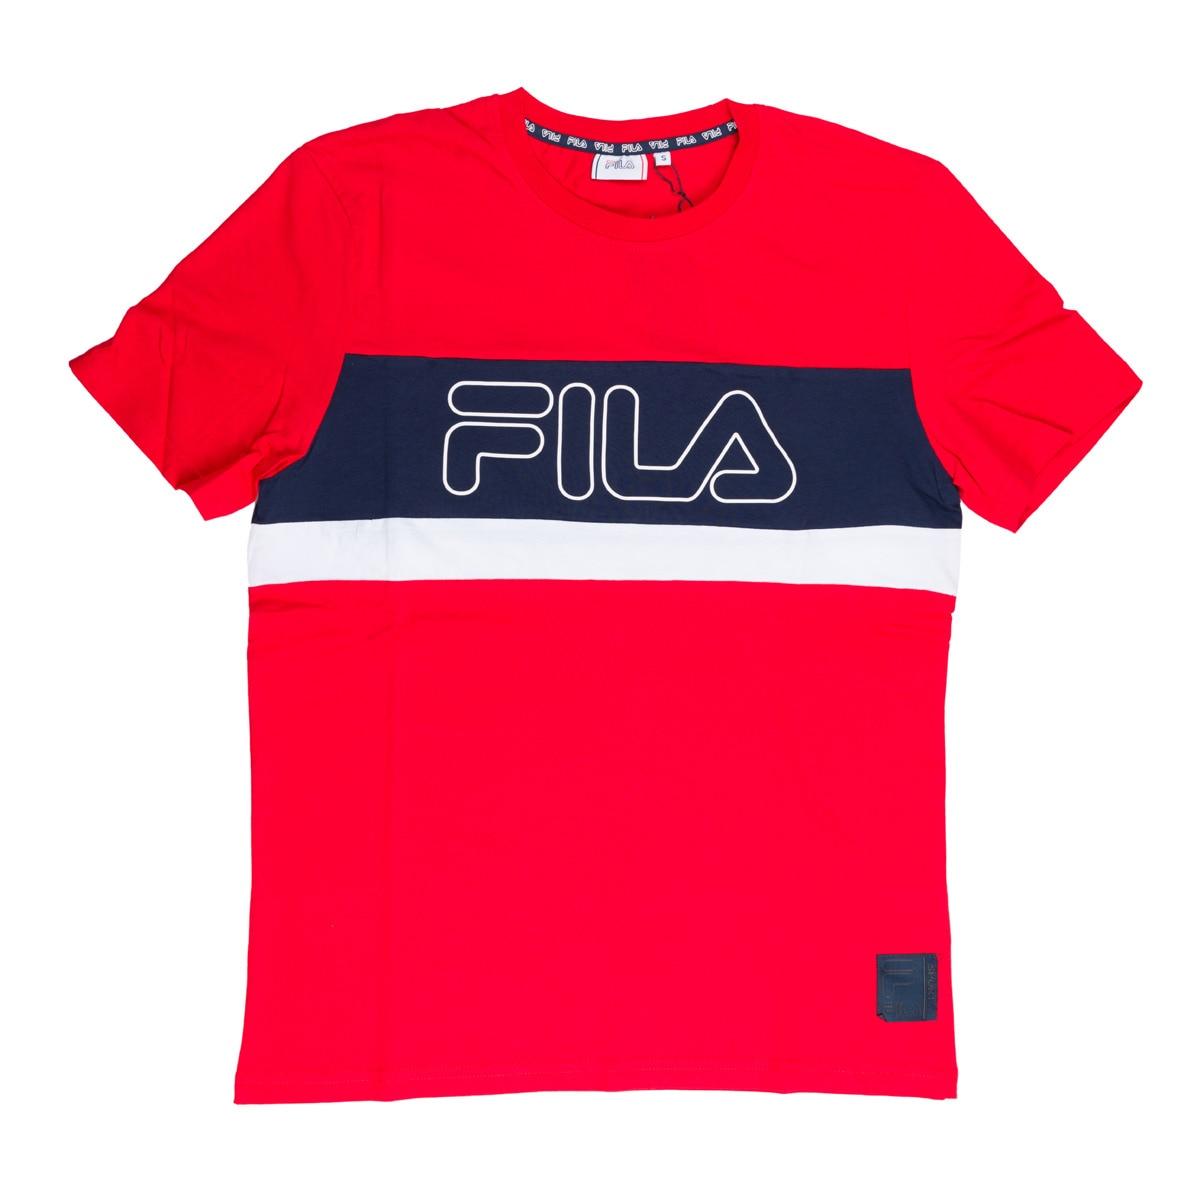 Camiseta de hombre Laurens Fila